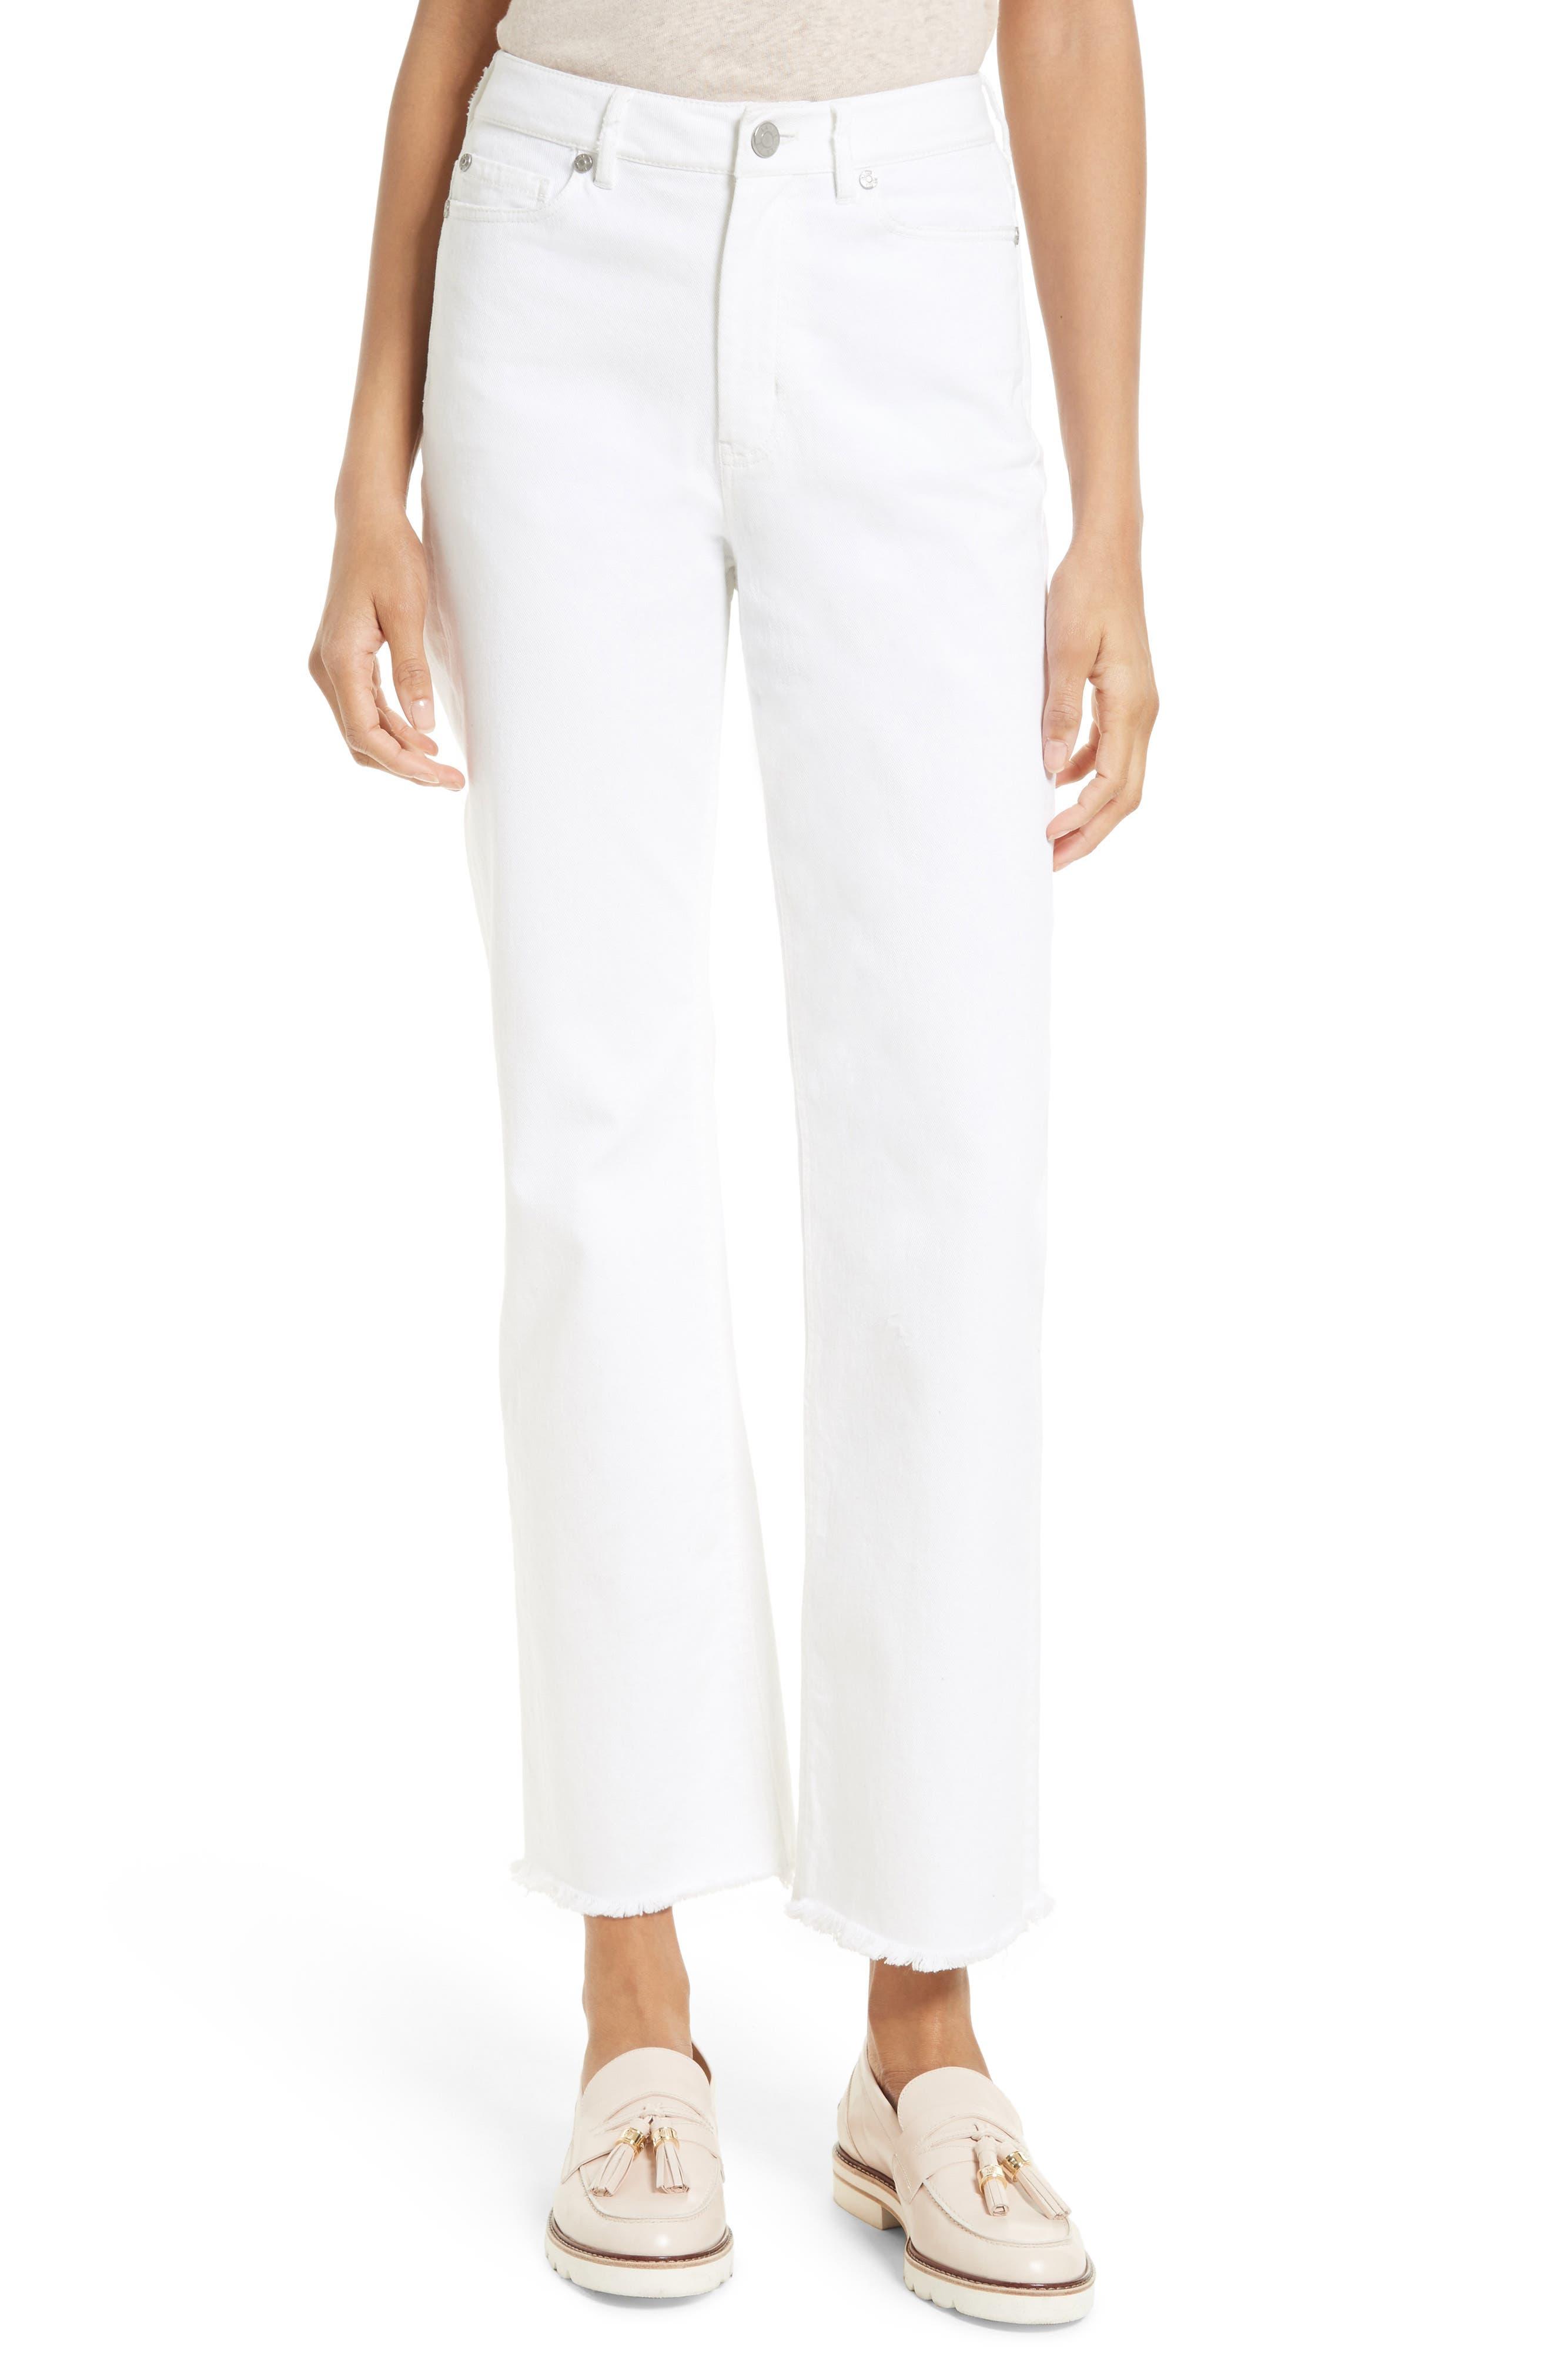 La Vie Rebecca Taylor Anais Frayed Hem Wide Leg Crop Jeans (Sea Salt)